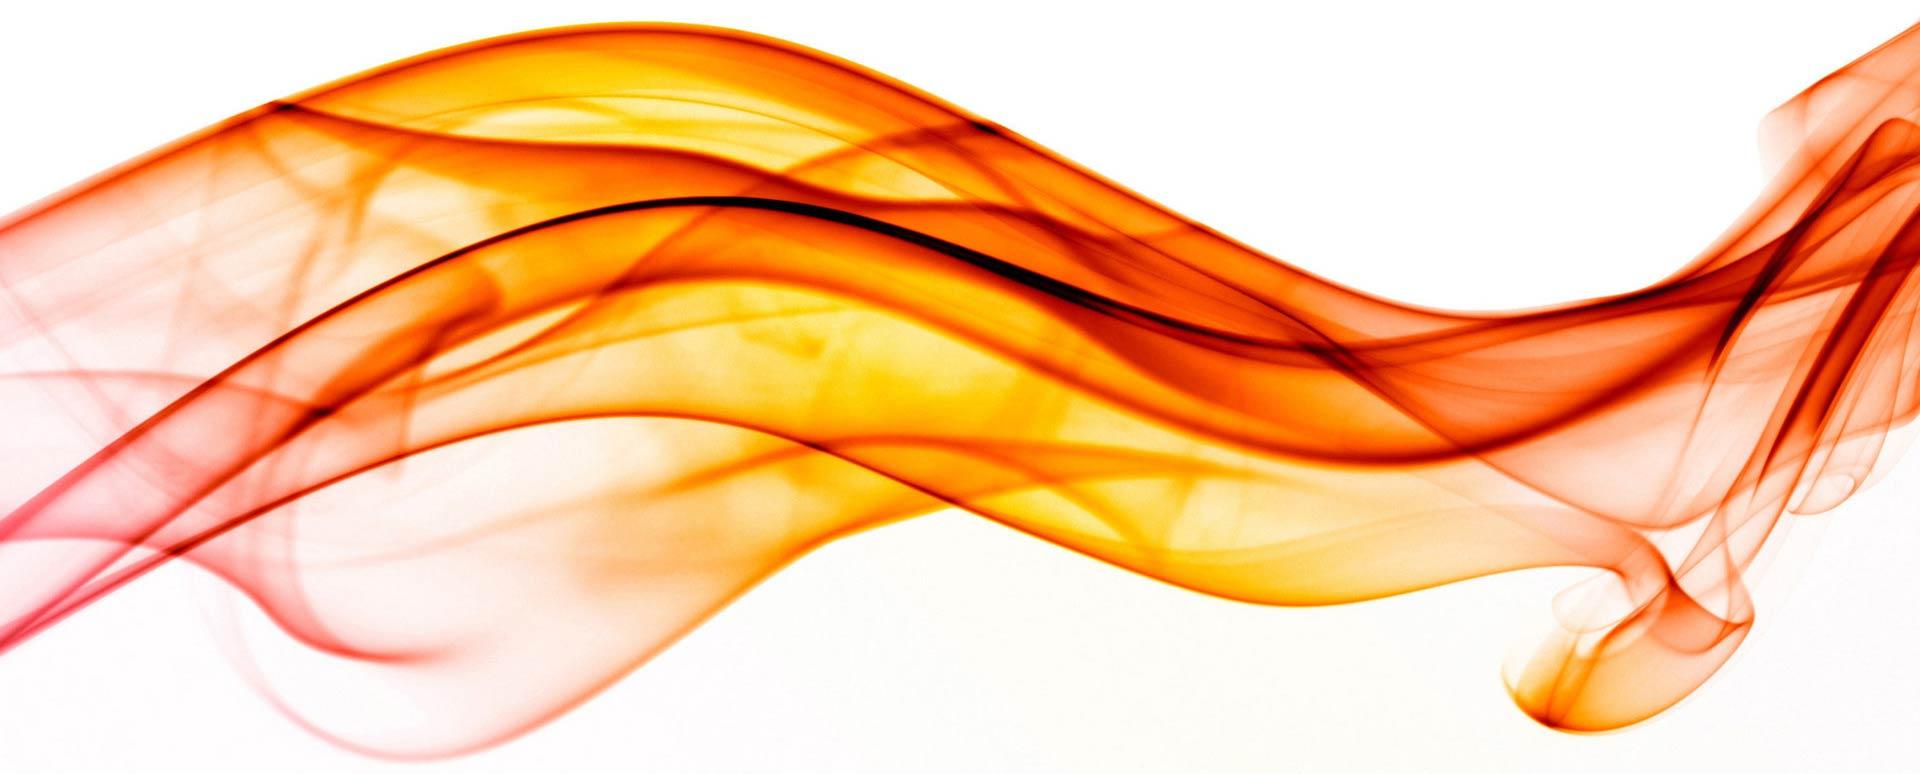 Orange-Smoke-Abstract-Background-sm